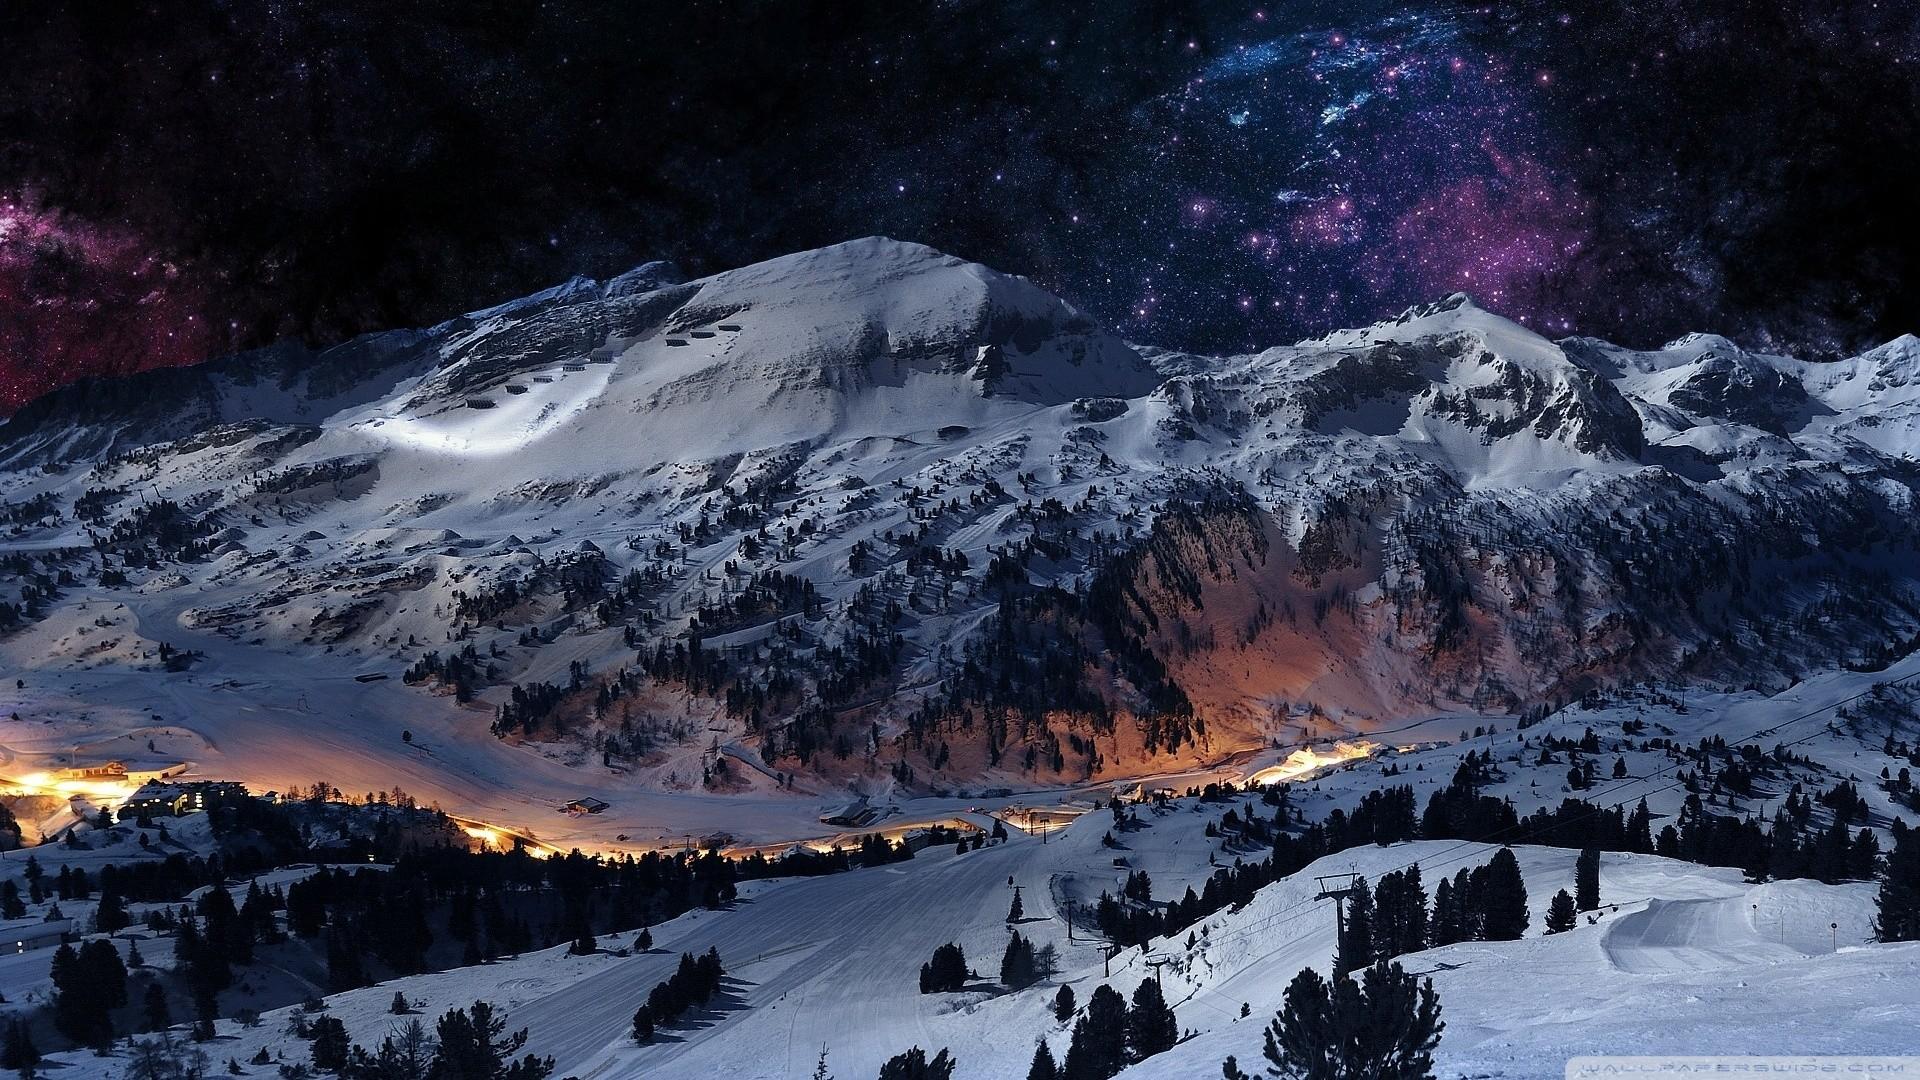 Desktop Wallpaper Snowy Night Scenes. Desktop Wallpaper Snow Christmas –  christmas wallpaper with cabin .